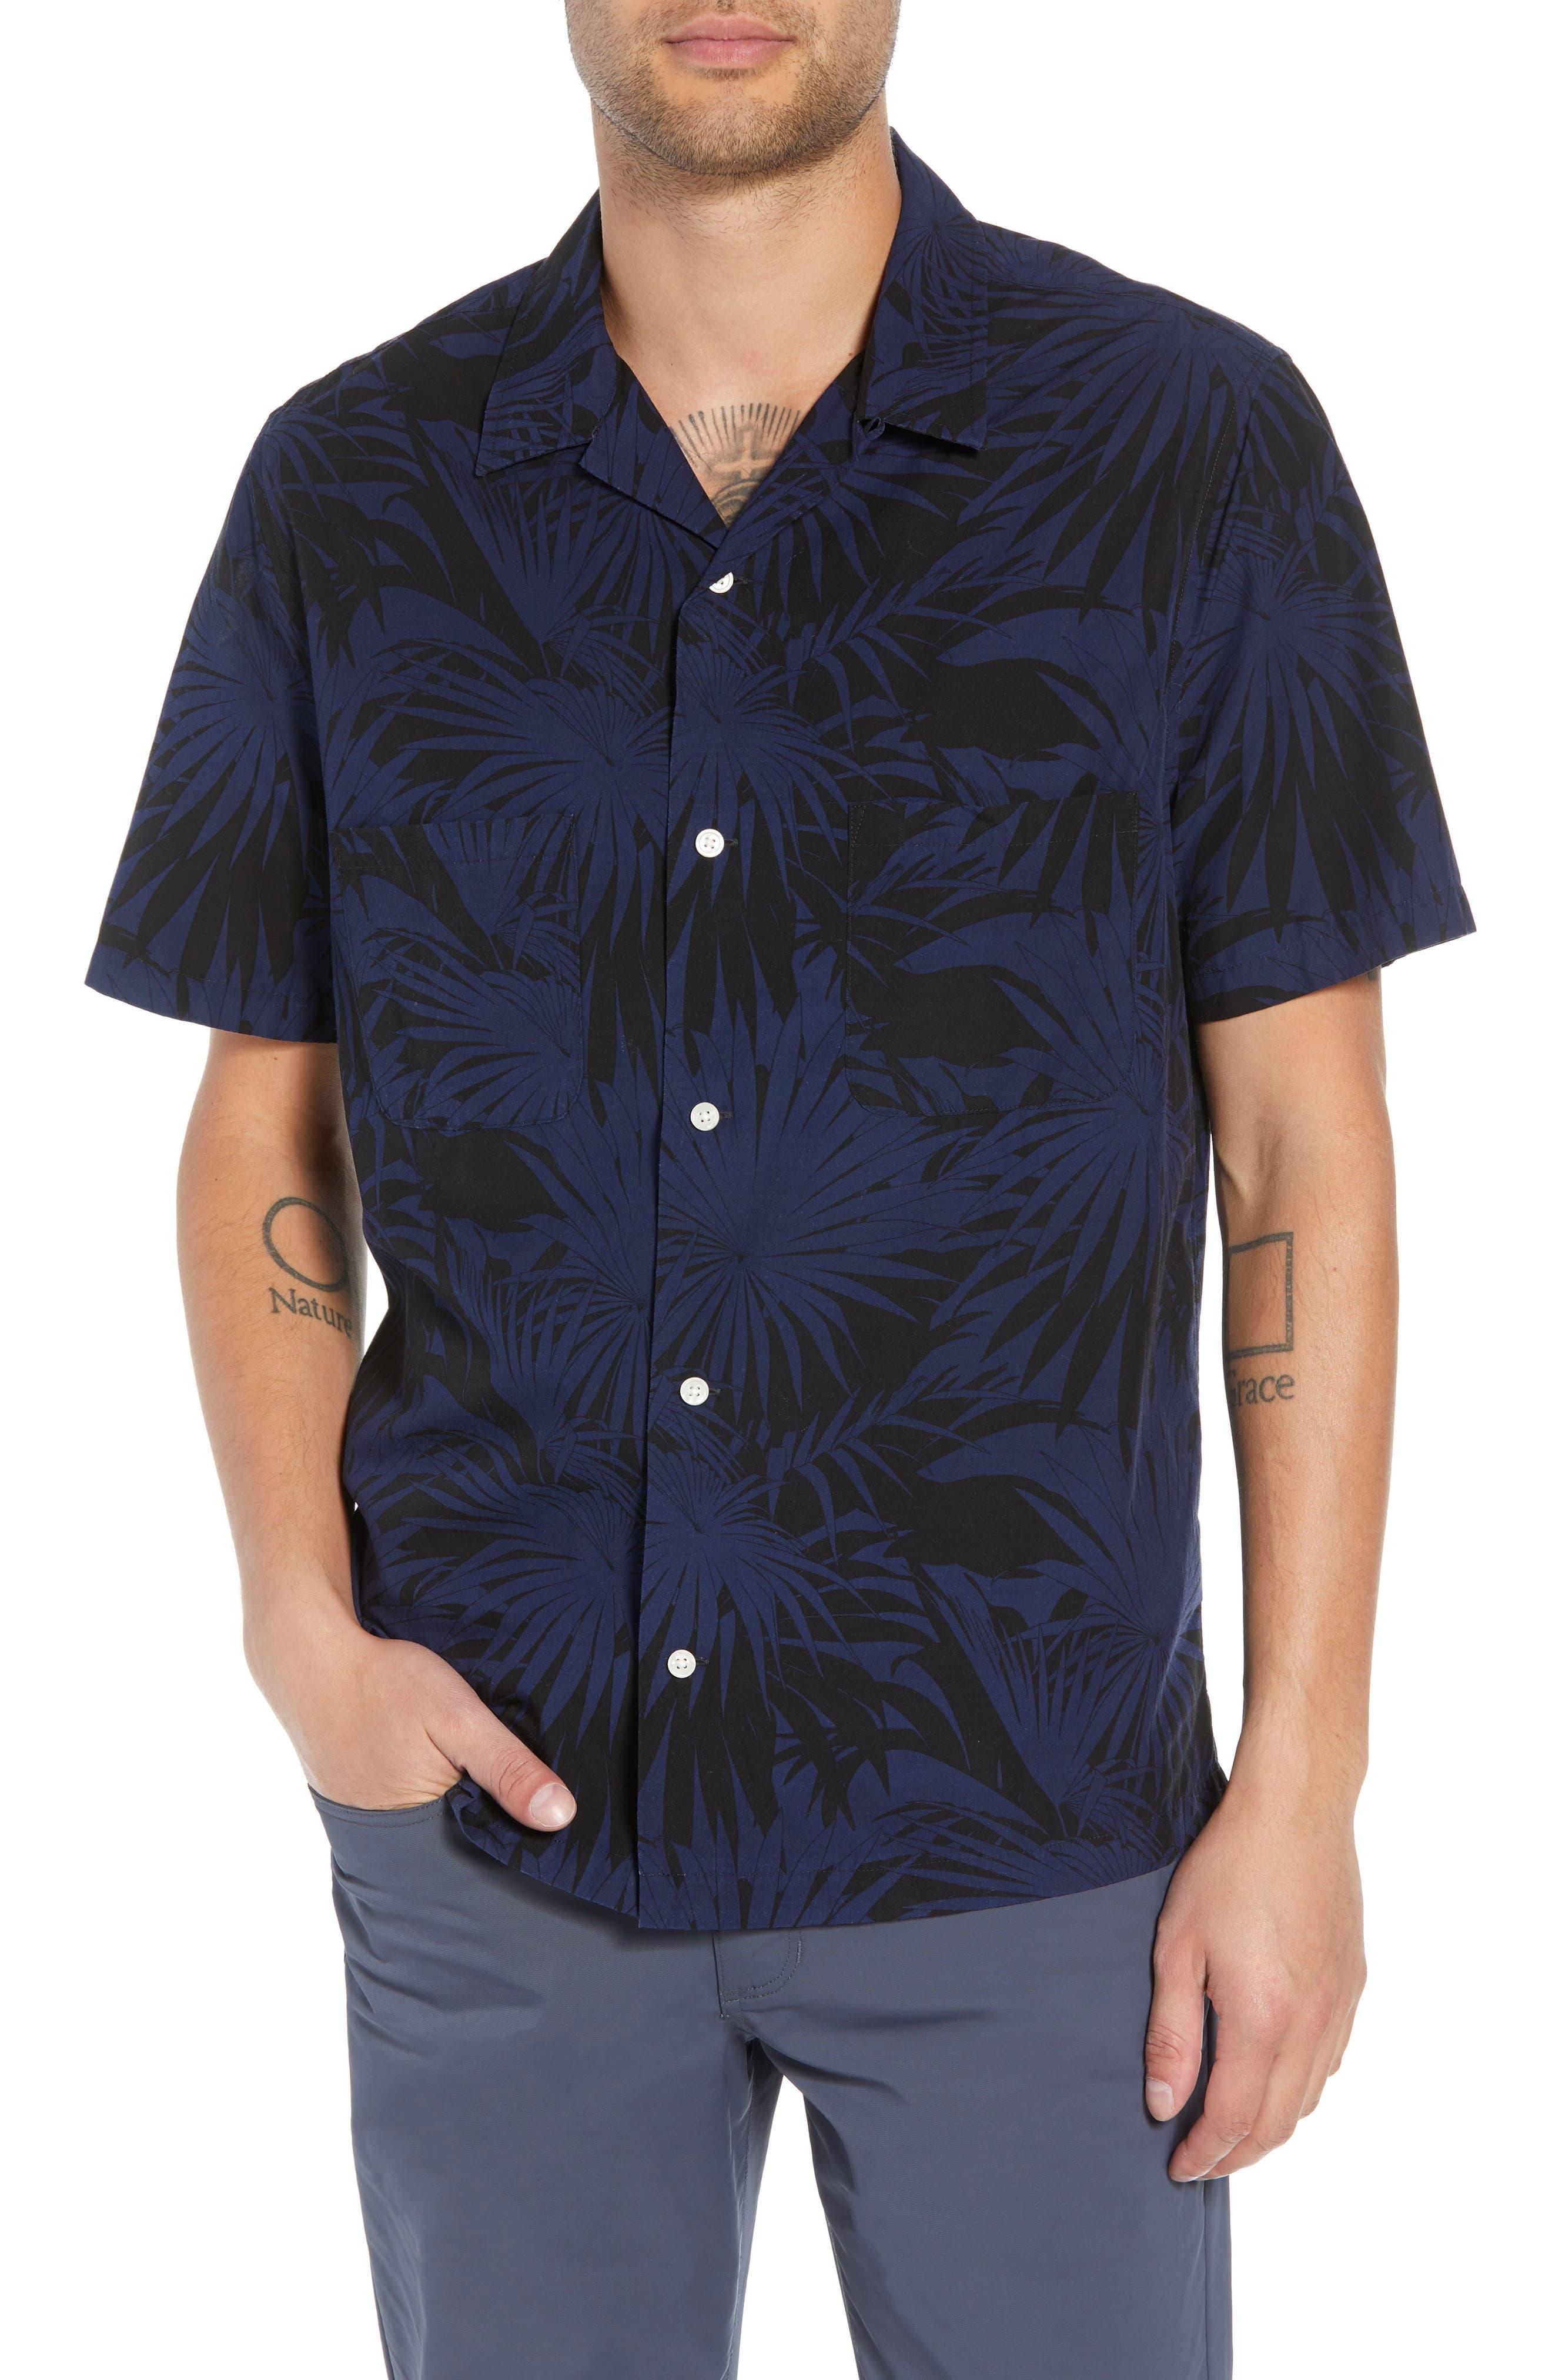 Palm Leaf Cabana Woven Shirt,                             Main thumbnail 1, color,                             001